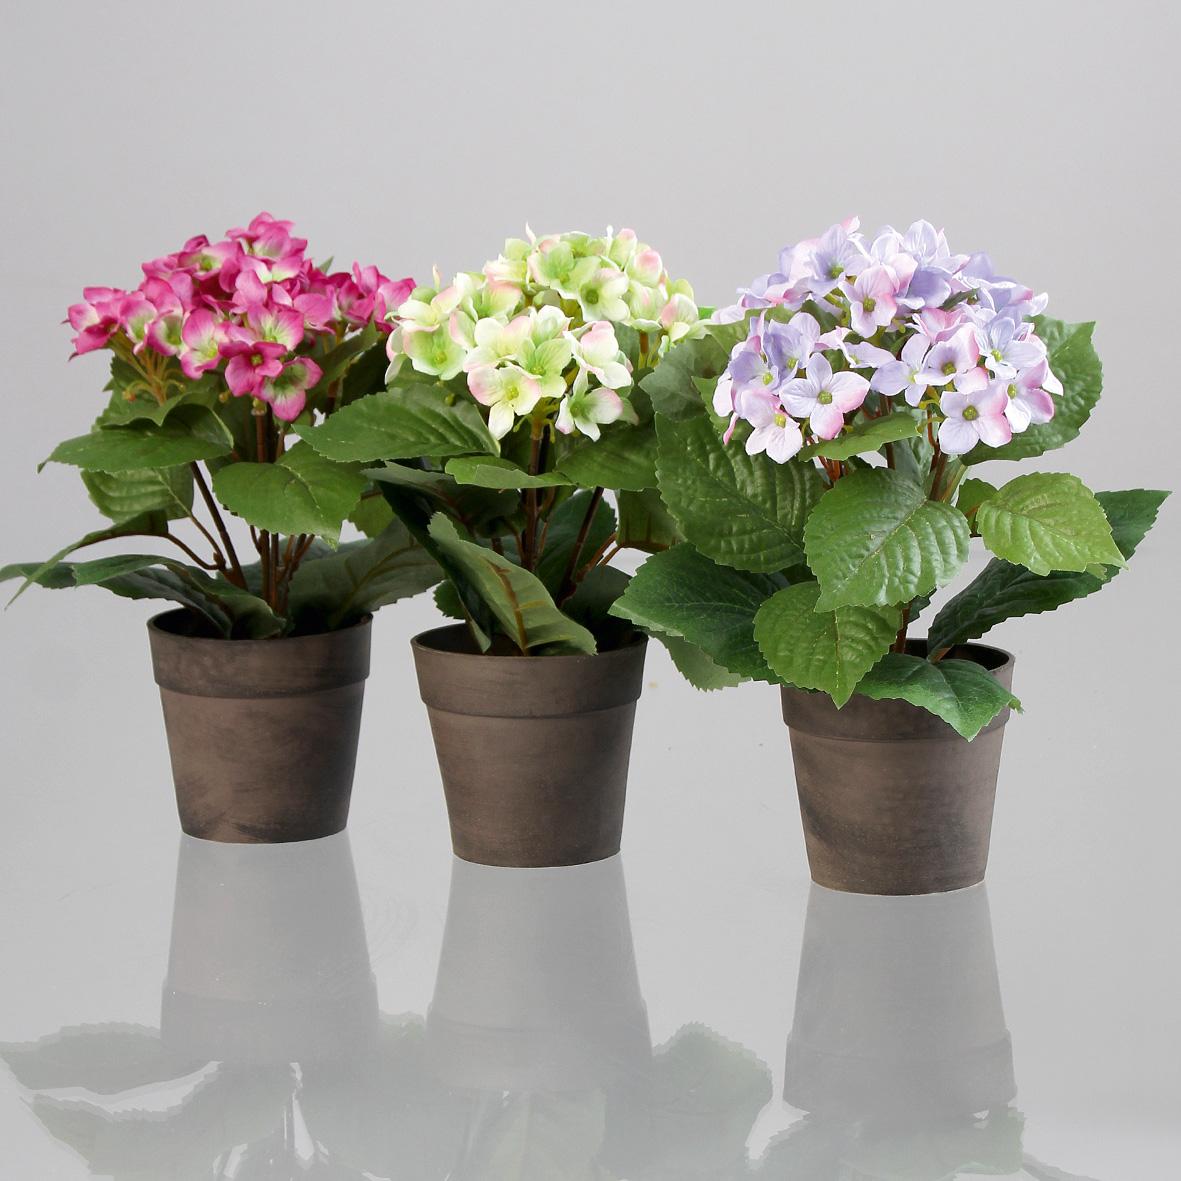 Hortensie Kunstpflanze im Topf Sortiment 3 Stück creme fuchsia blau